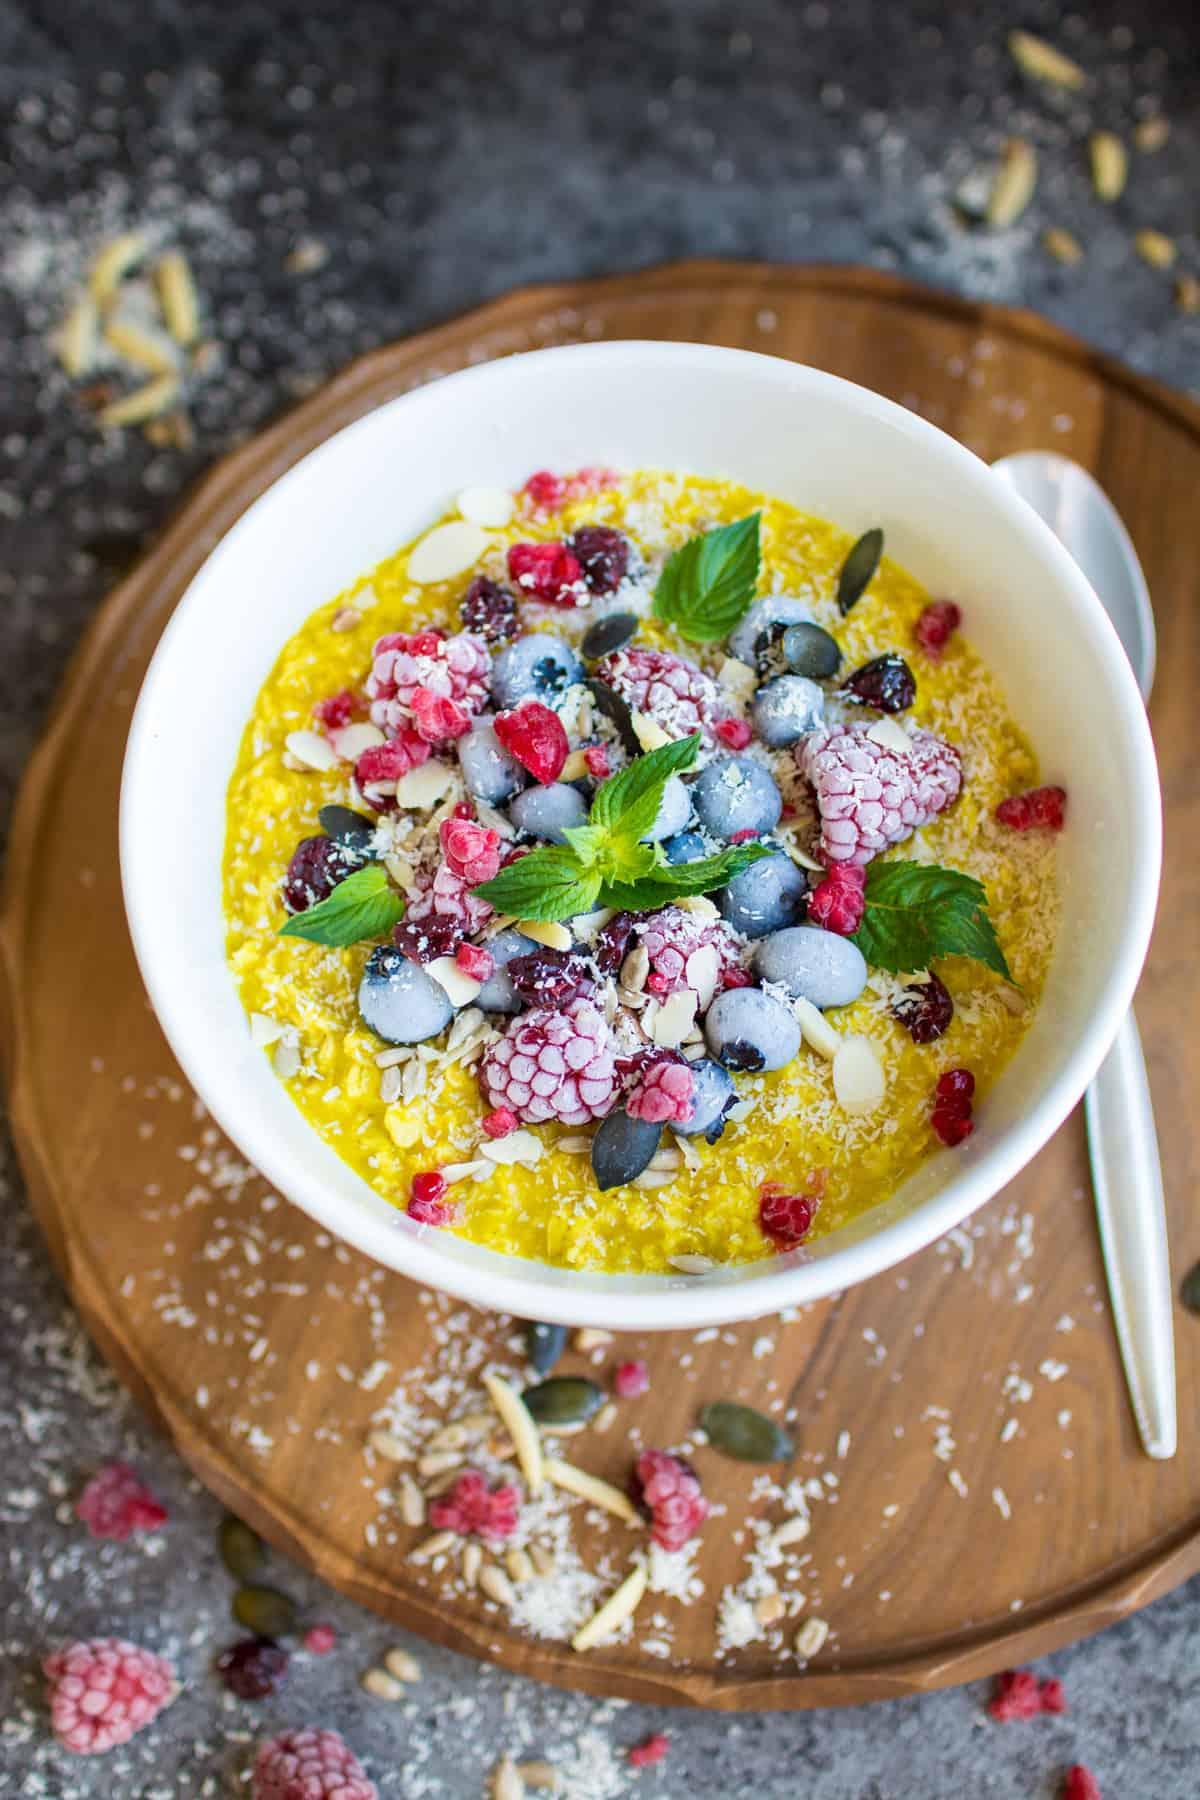 Turmeric oatmeal bowl with berries